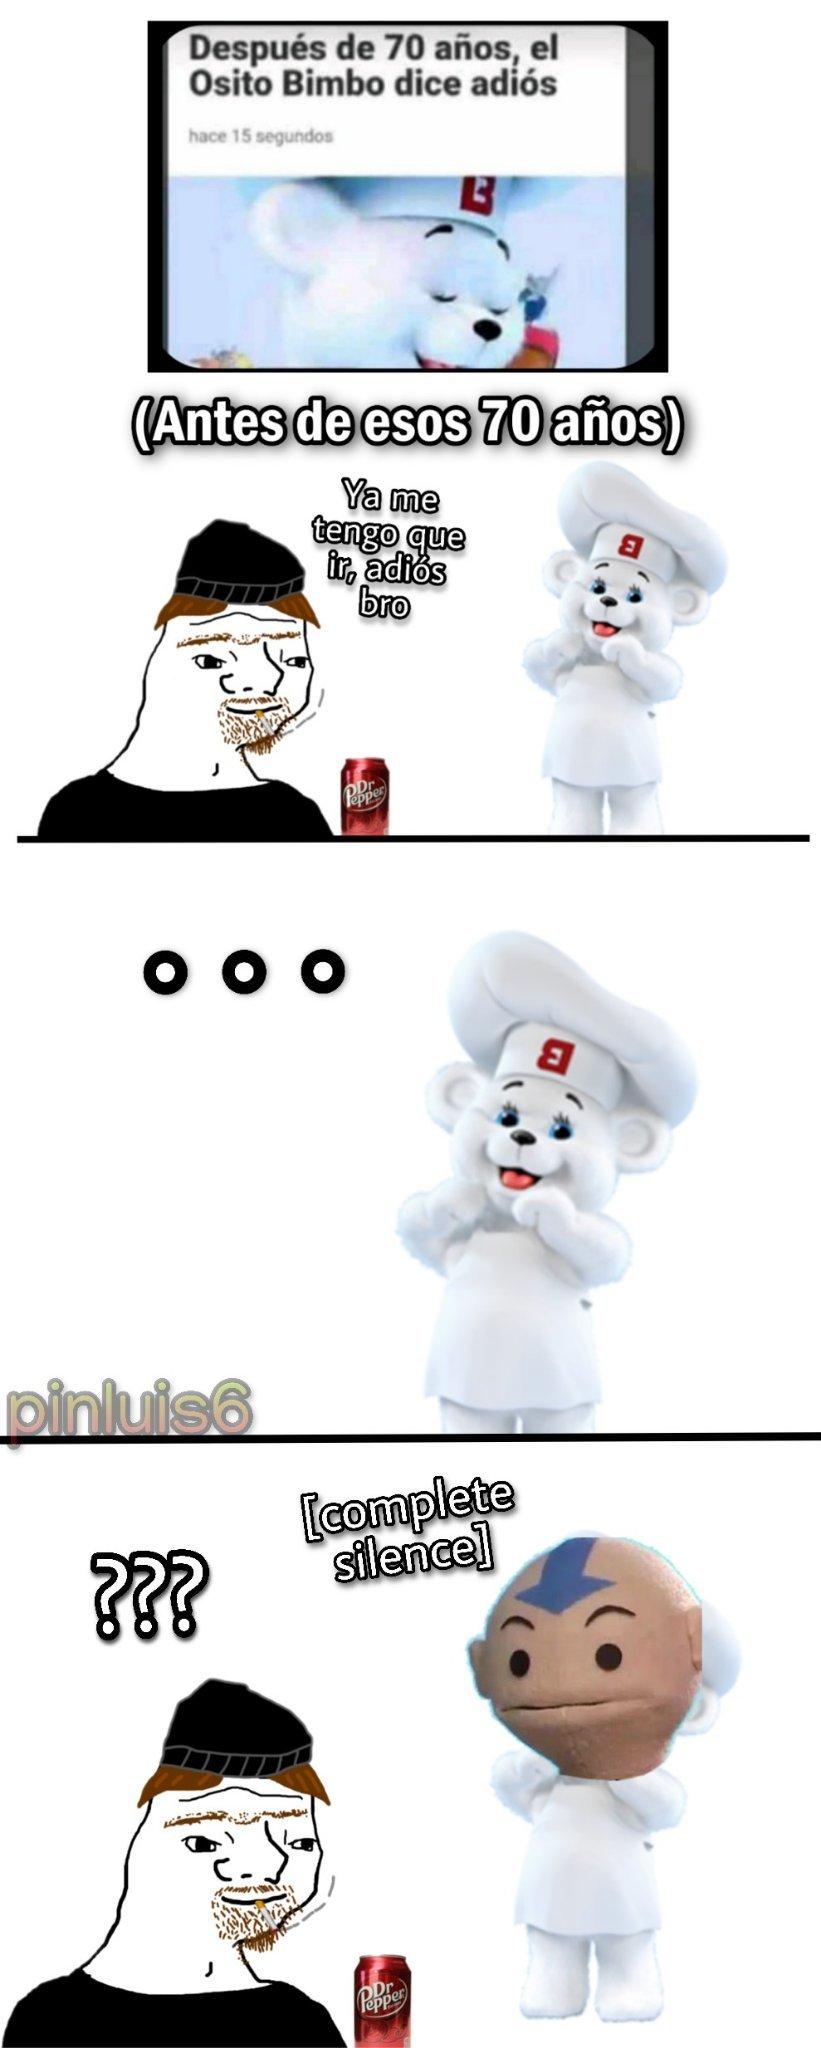 wea imbécil XD - meme